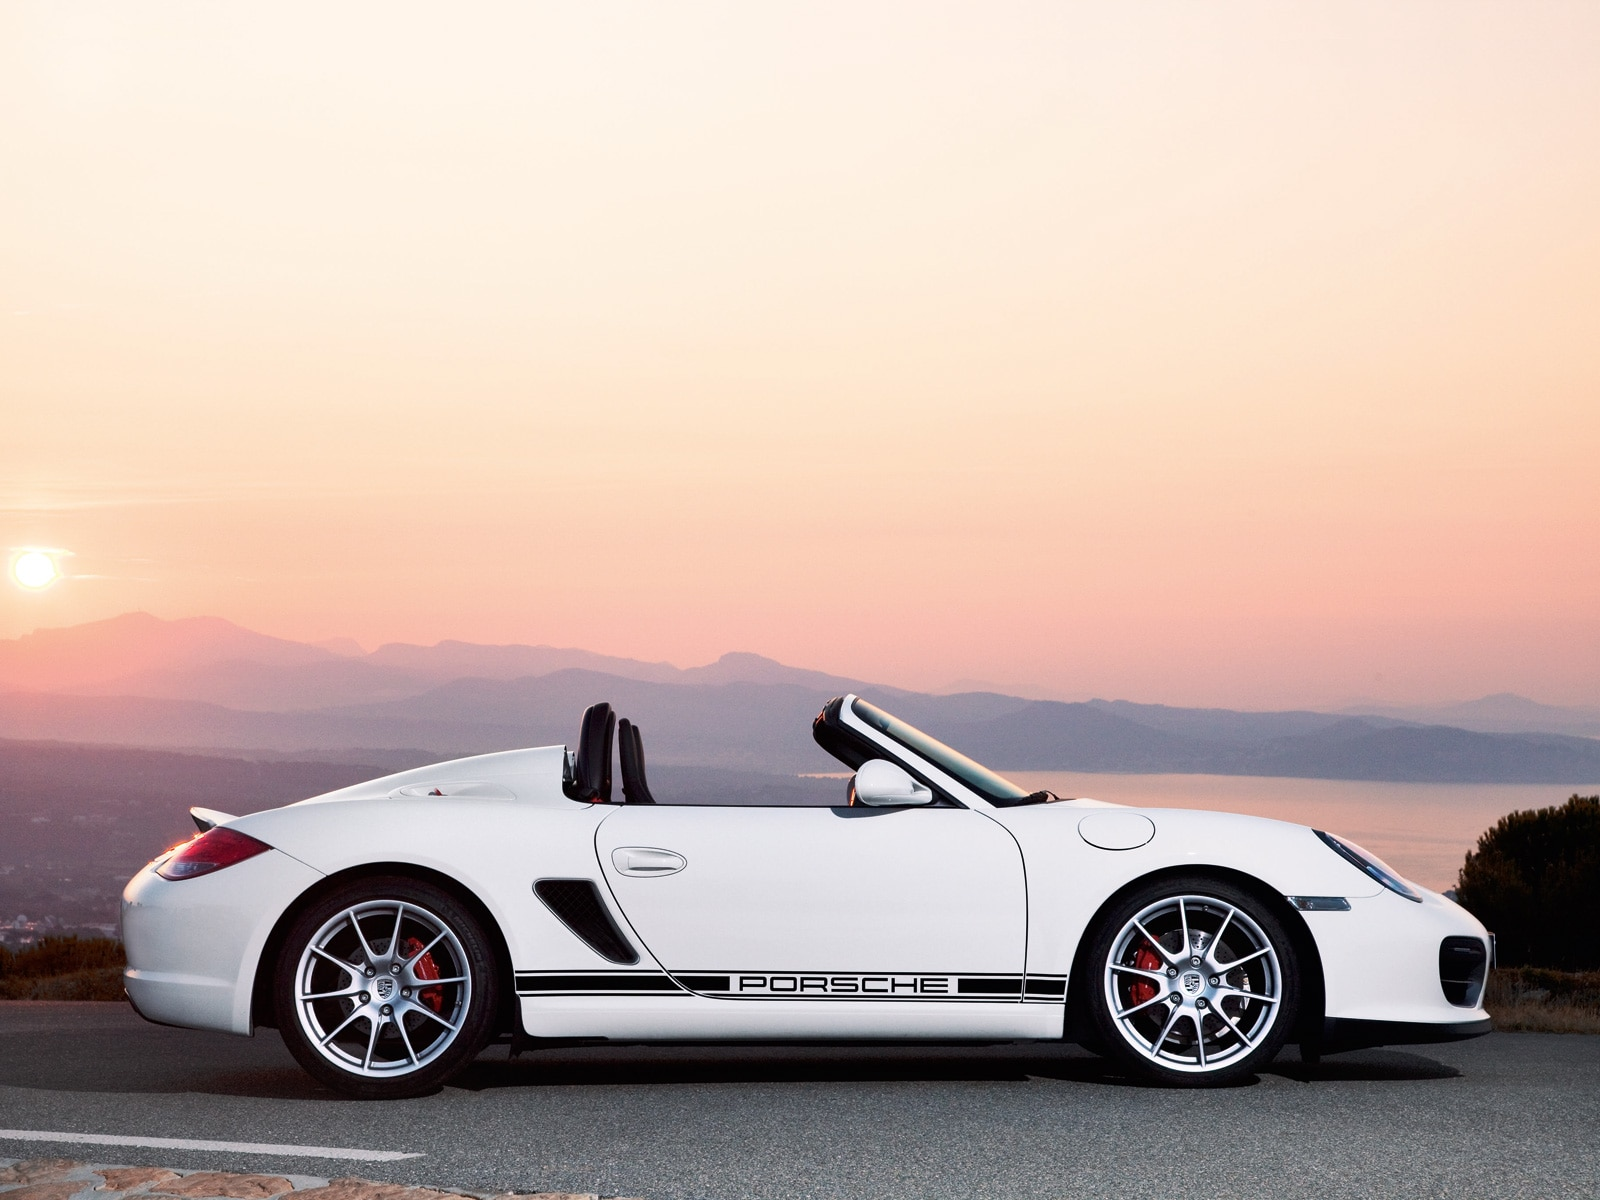 0911 06 Z 2011 Porsche Boxster Spyder Profile